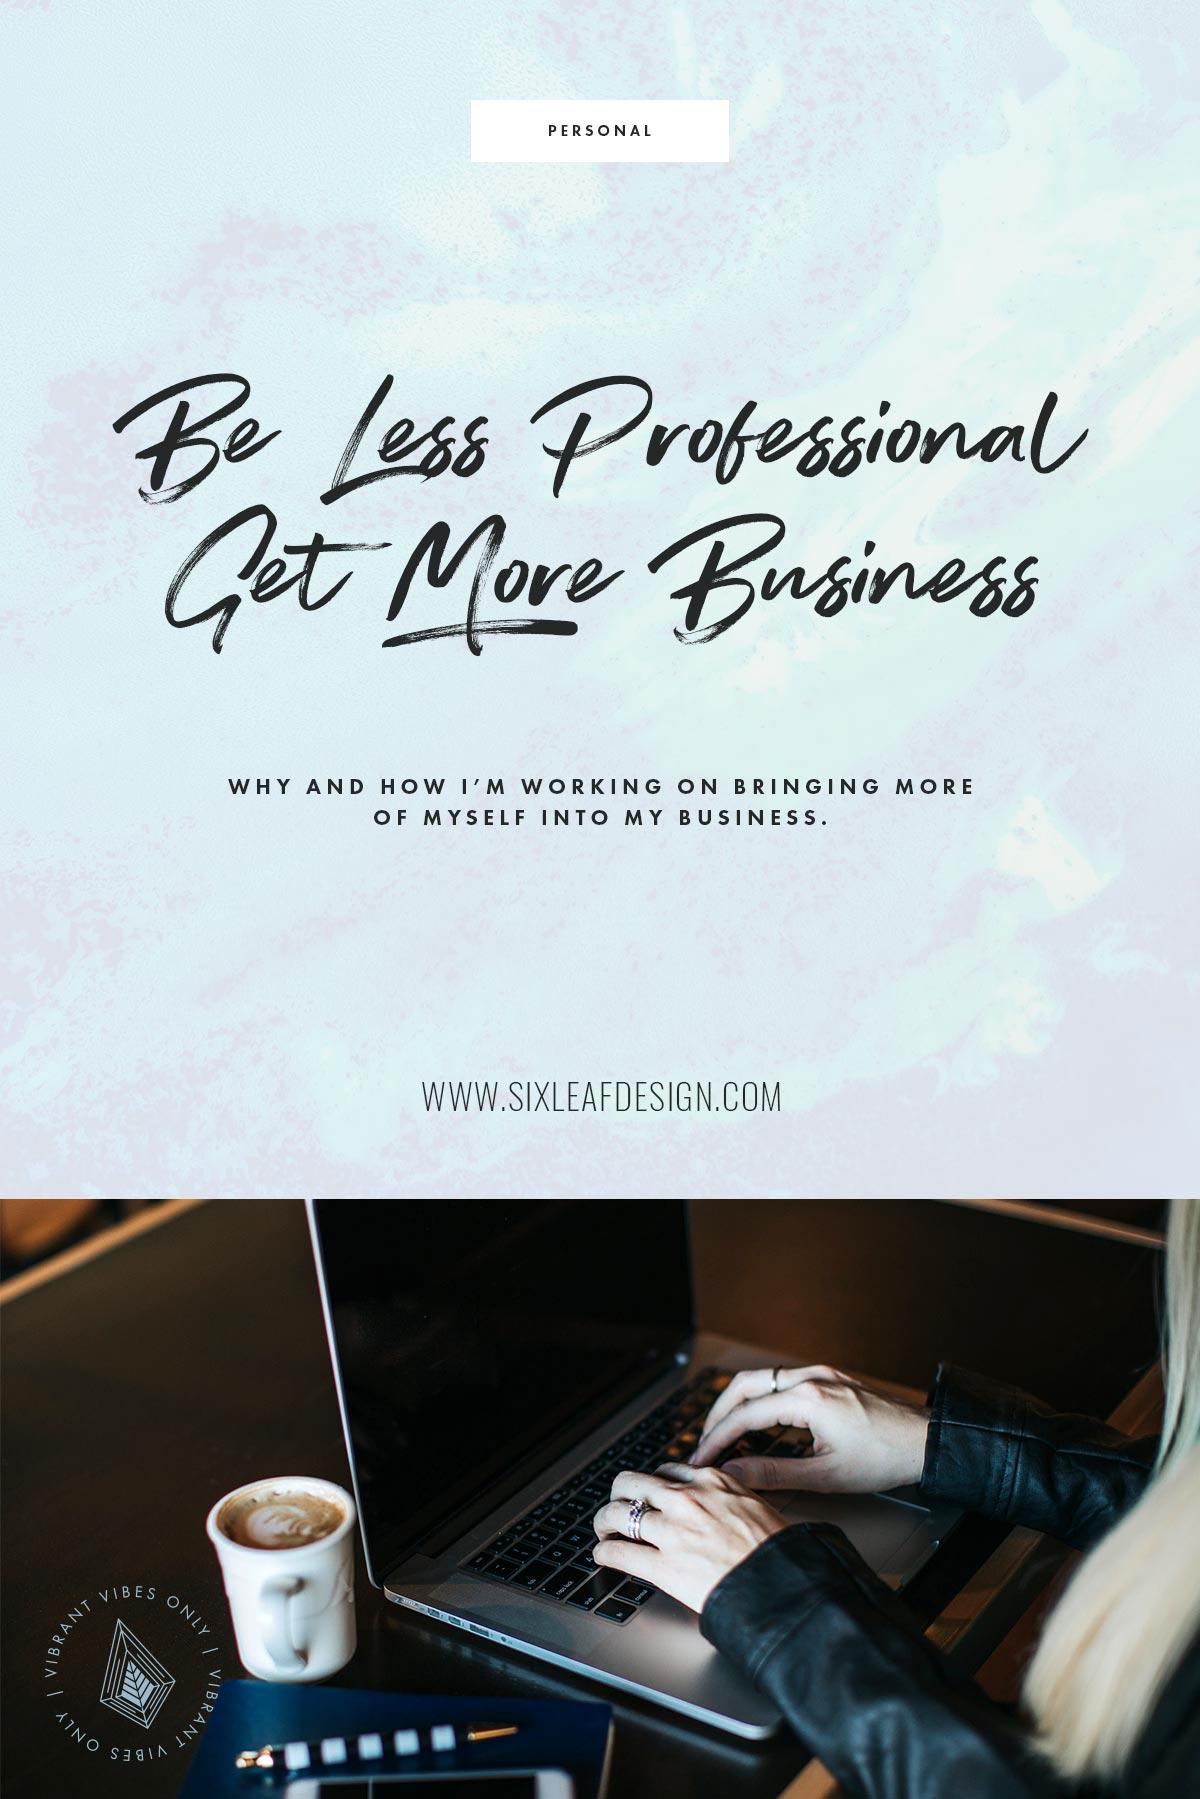 Be Less Professional, Get More Business | Business Tips | Six Leaf Design | Freelance We + Graphic Designer | Denver, Colorado